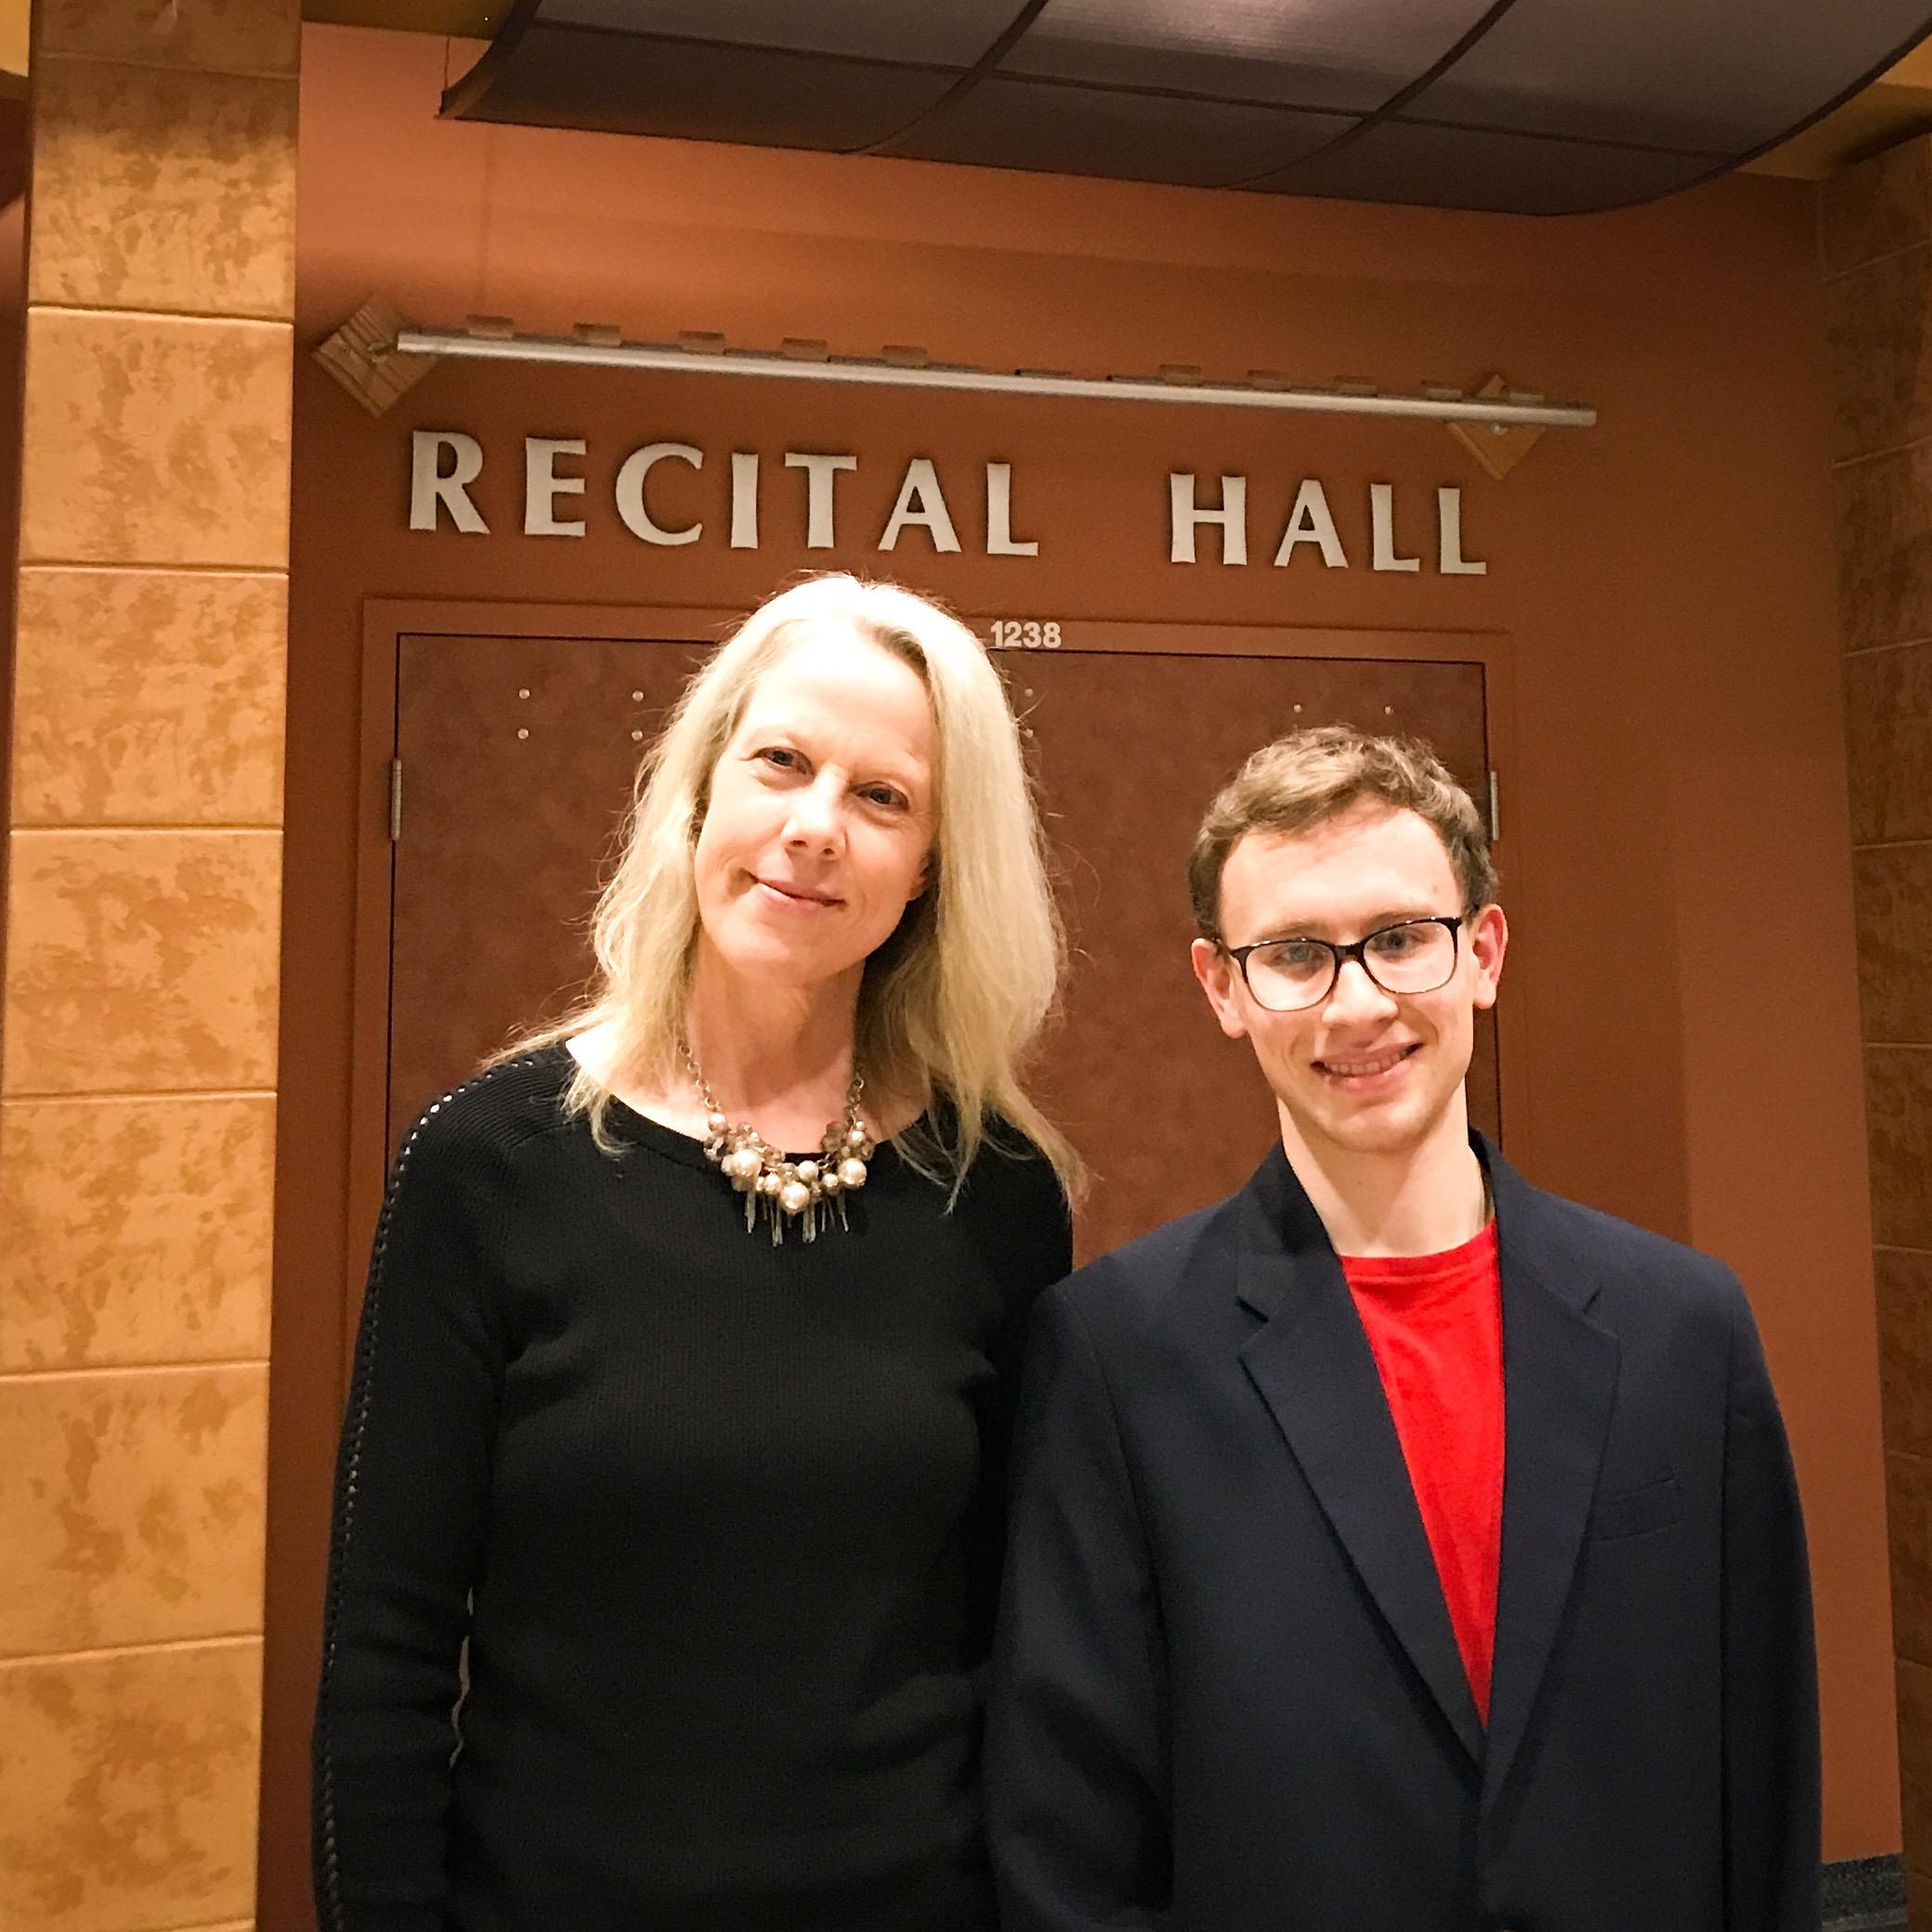 2018 winner Andrew Gurdak after his concerto performance